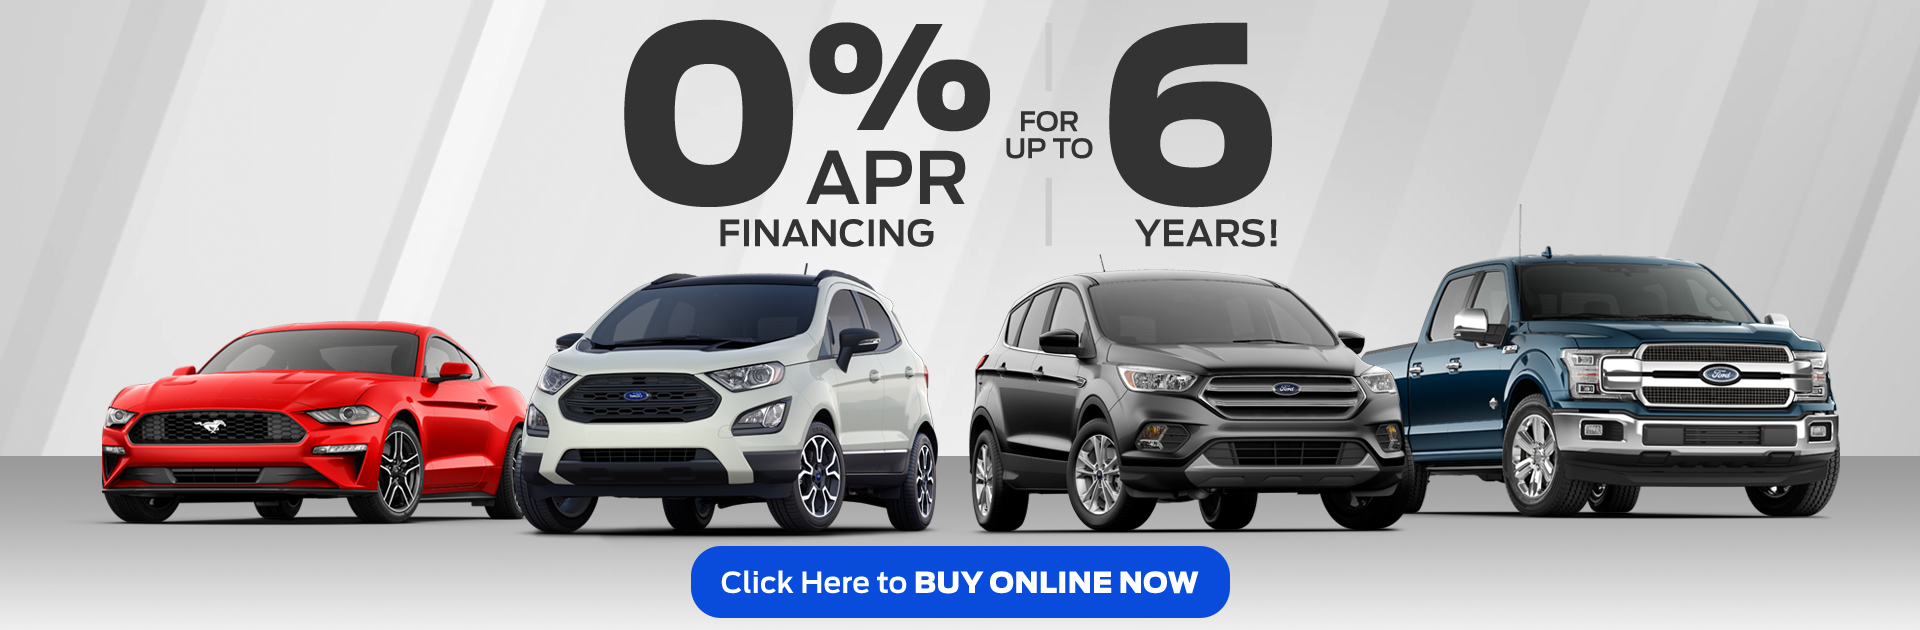 Lakeland Ford Dealership - New Cars, Crossovers, SUVs, Trucks in